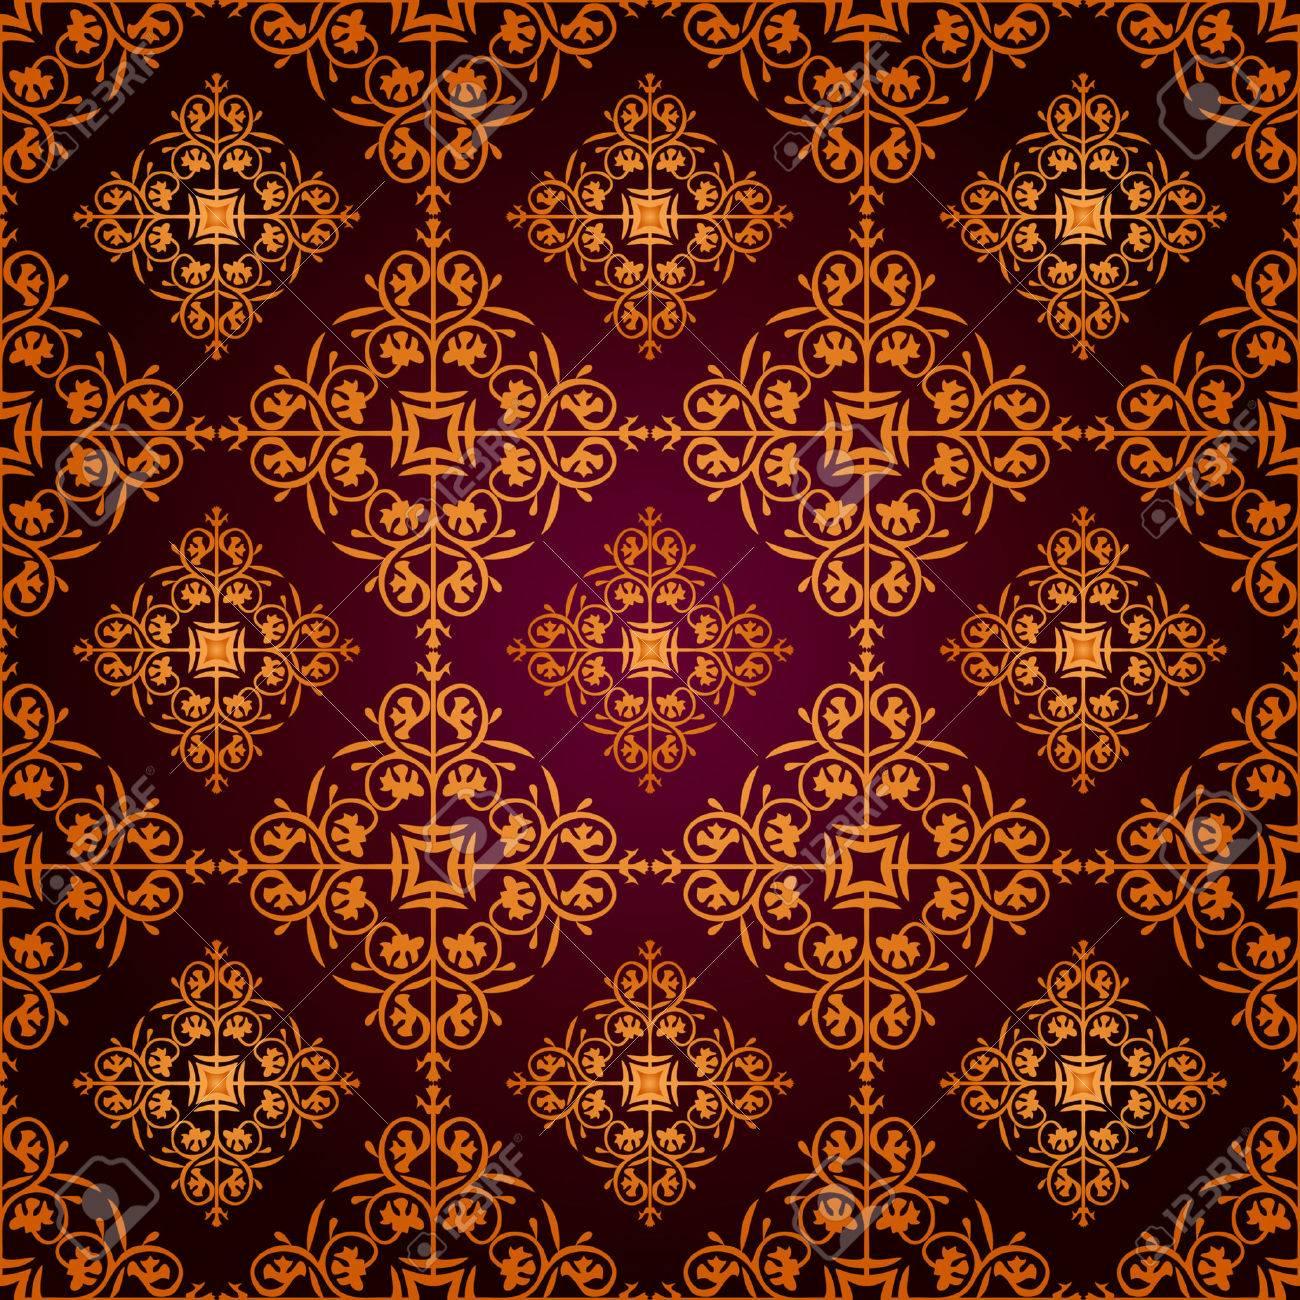 Seamless Gothic Wallpaper Stock Vector